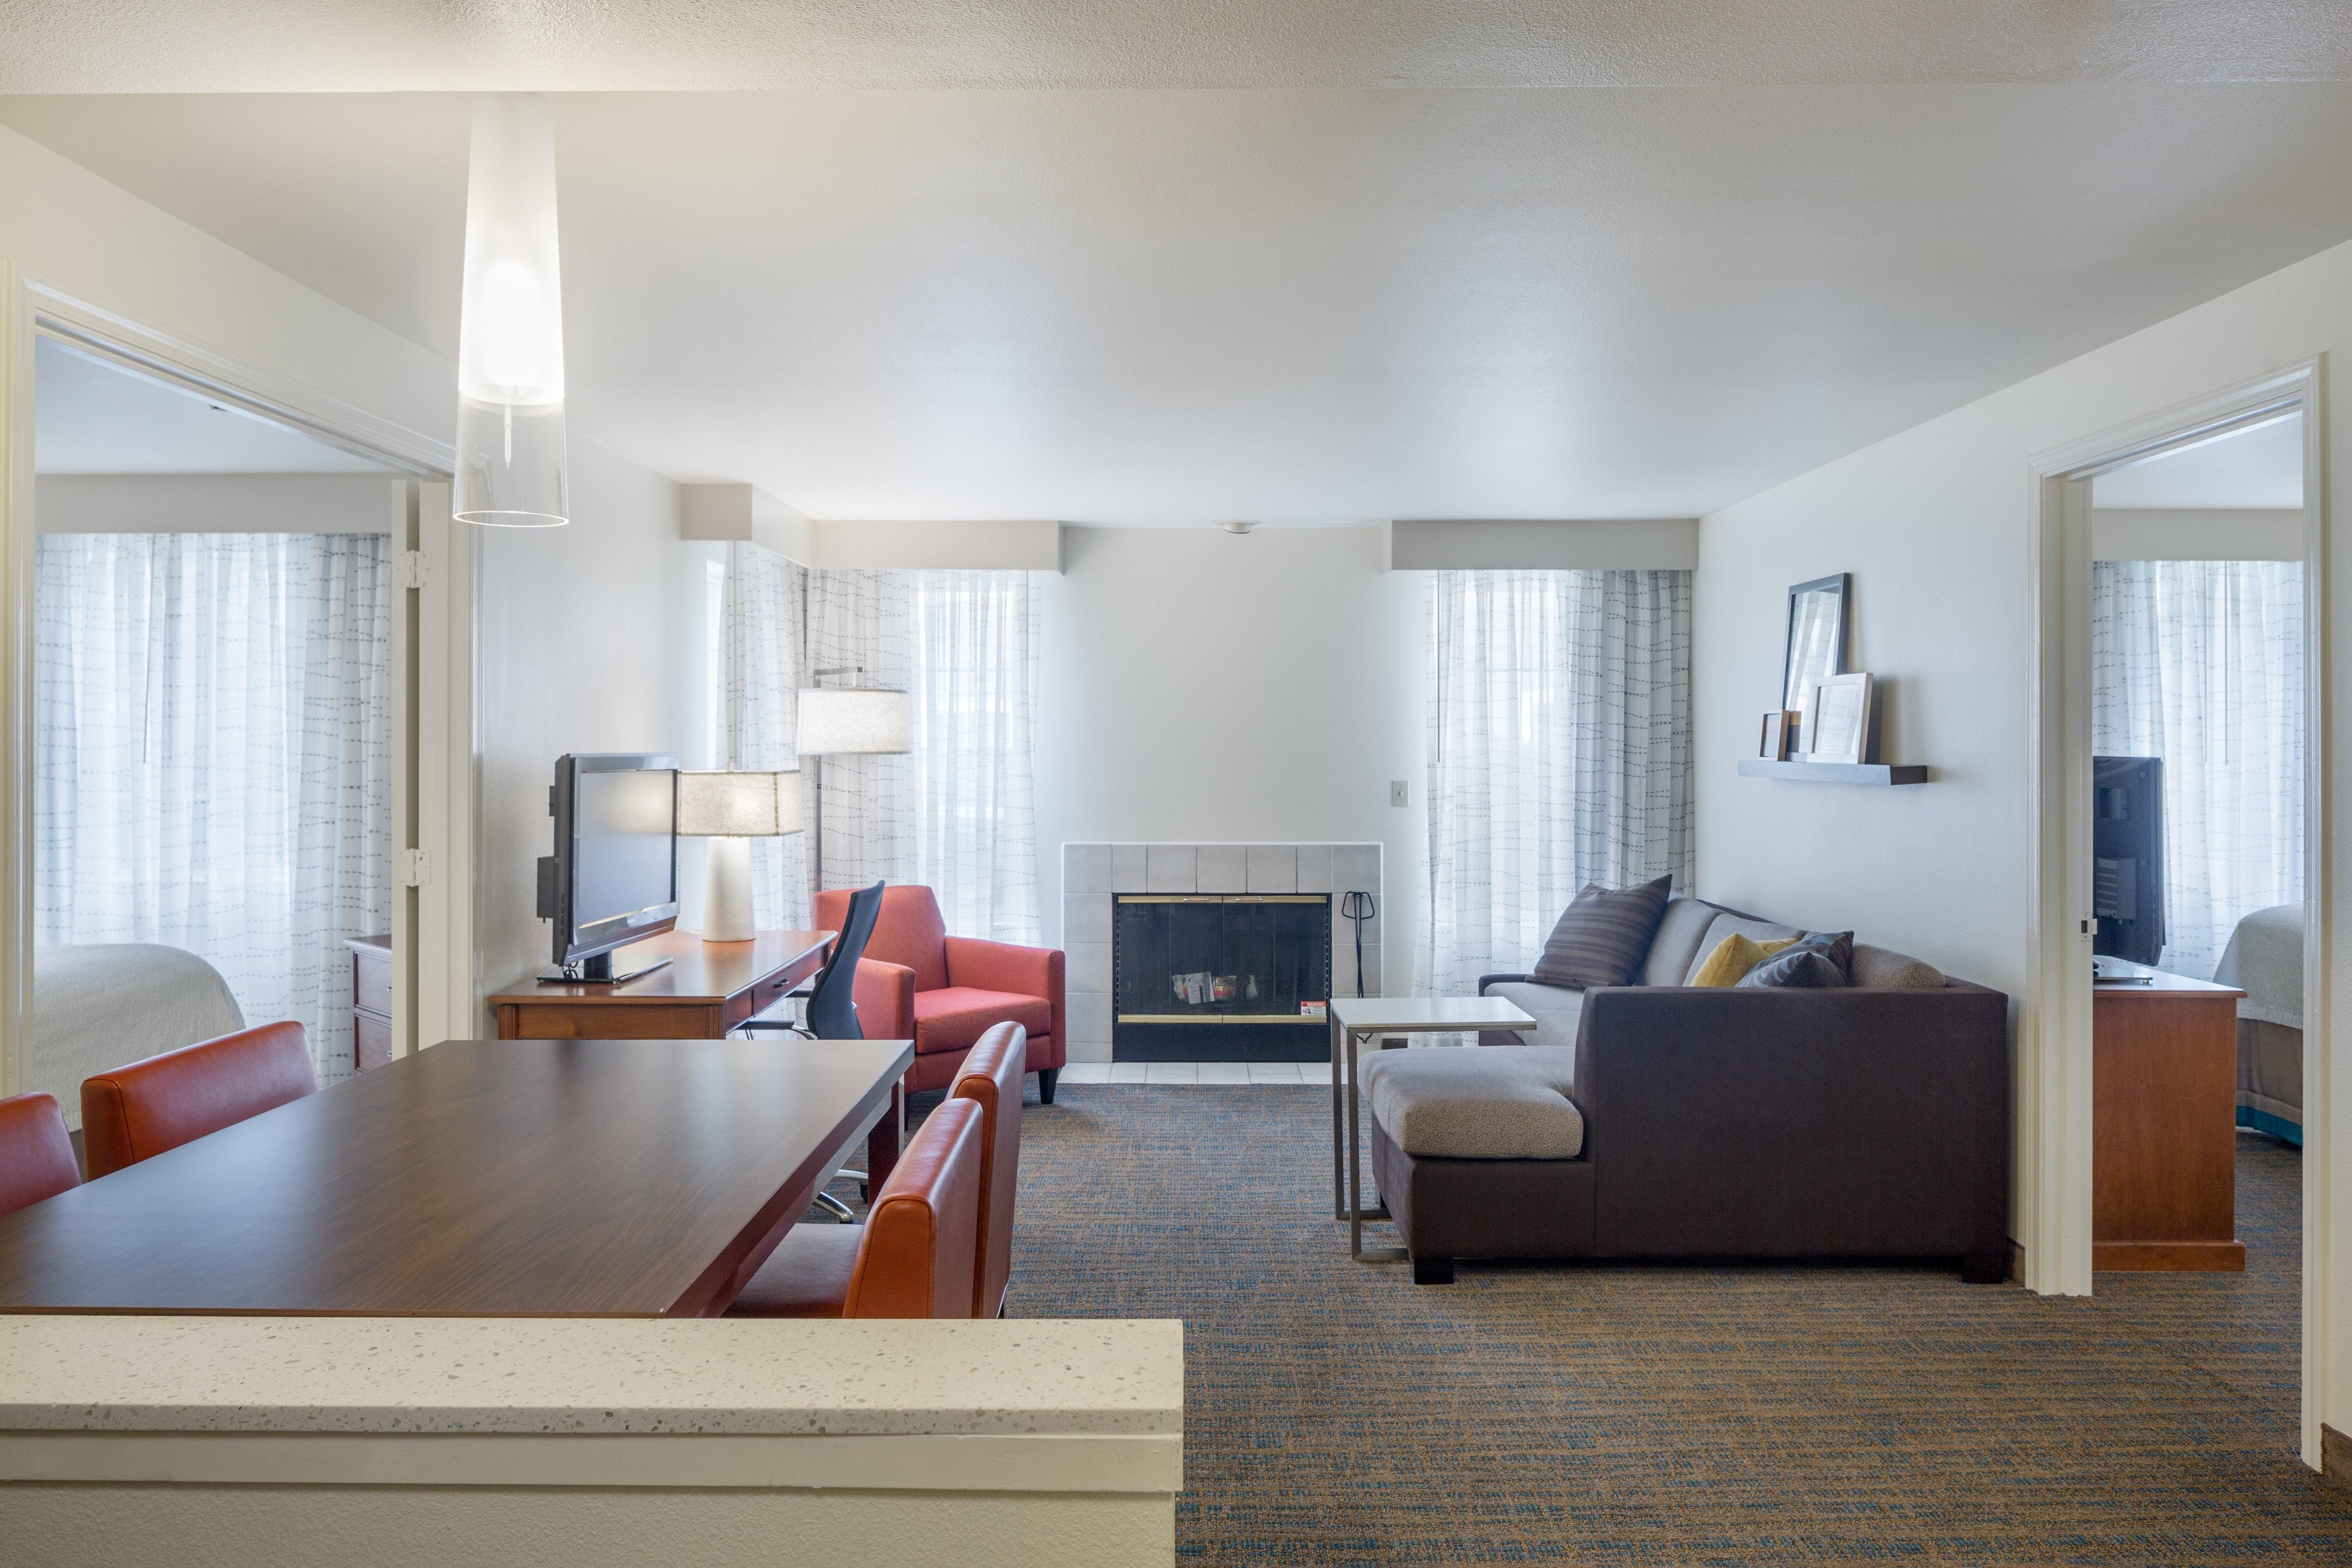 Residence inn by marriott portland hillsboro hillsboro - 2 bedroom suites portland oregon ...